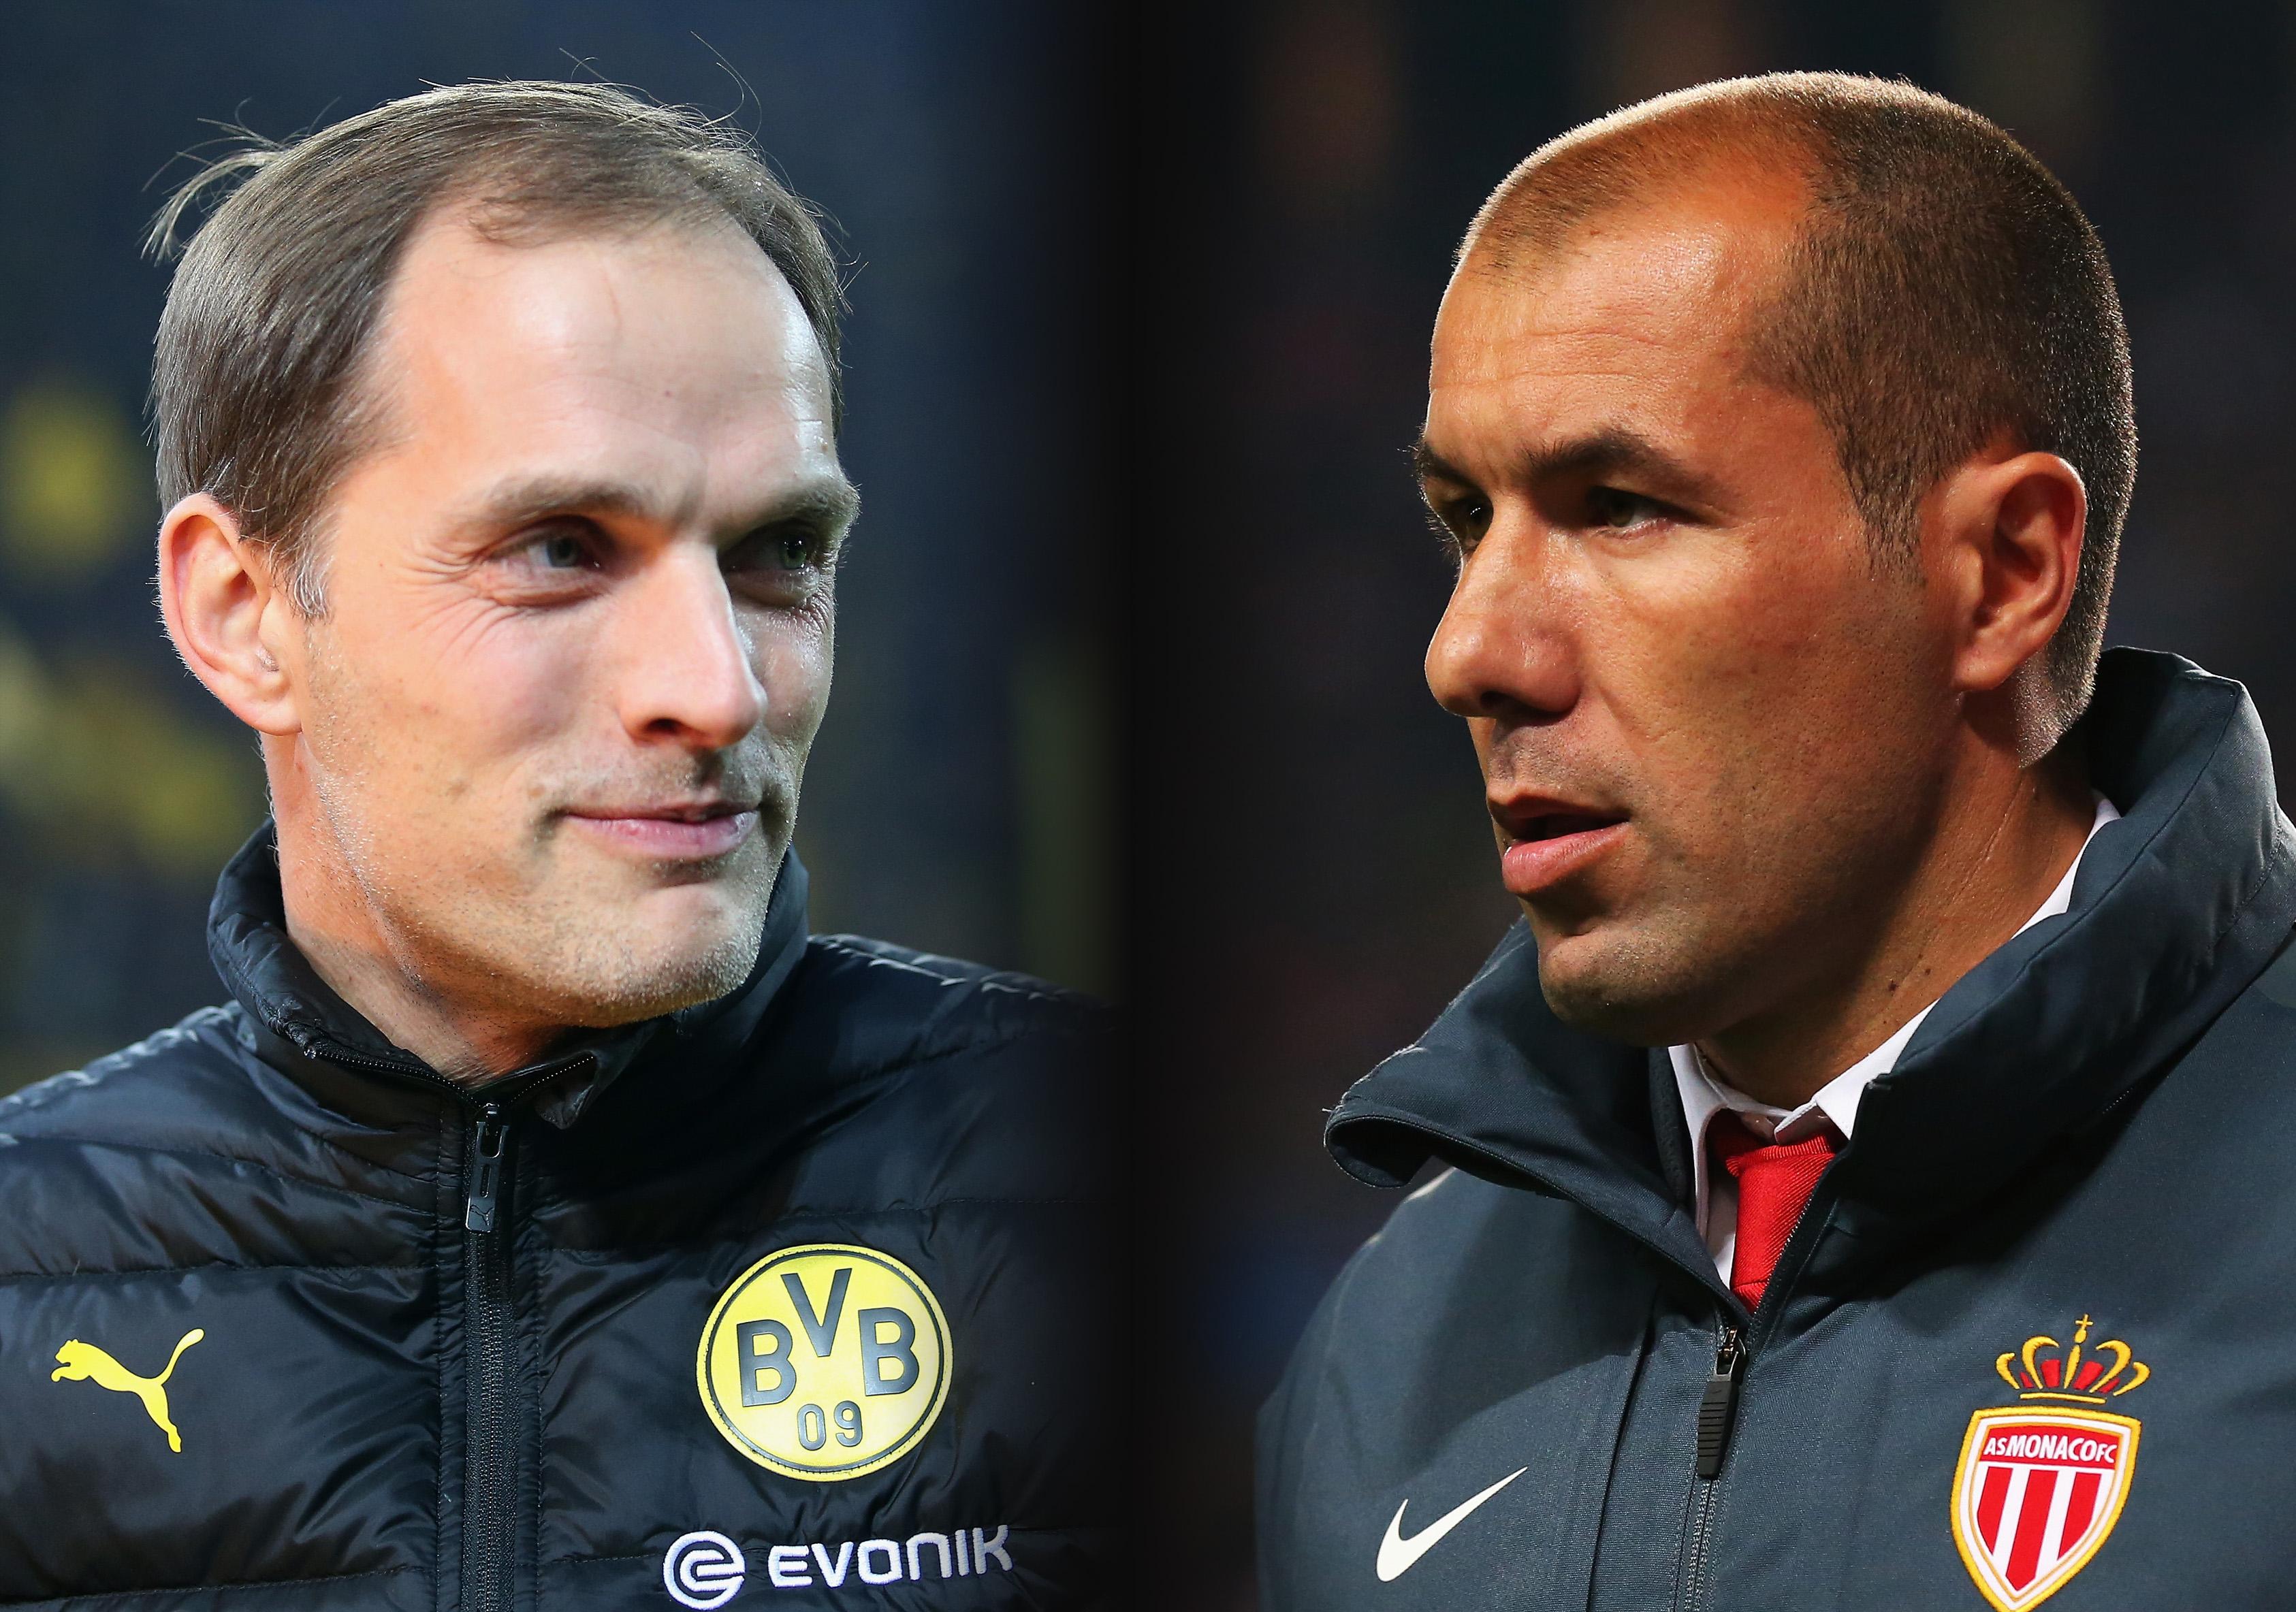 Borussia Dortmund v Monaco - UEFA Champions League Quarter-Final